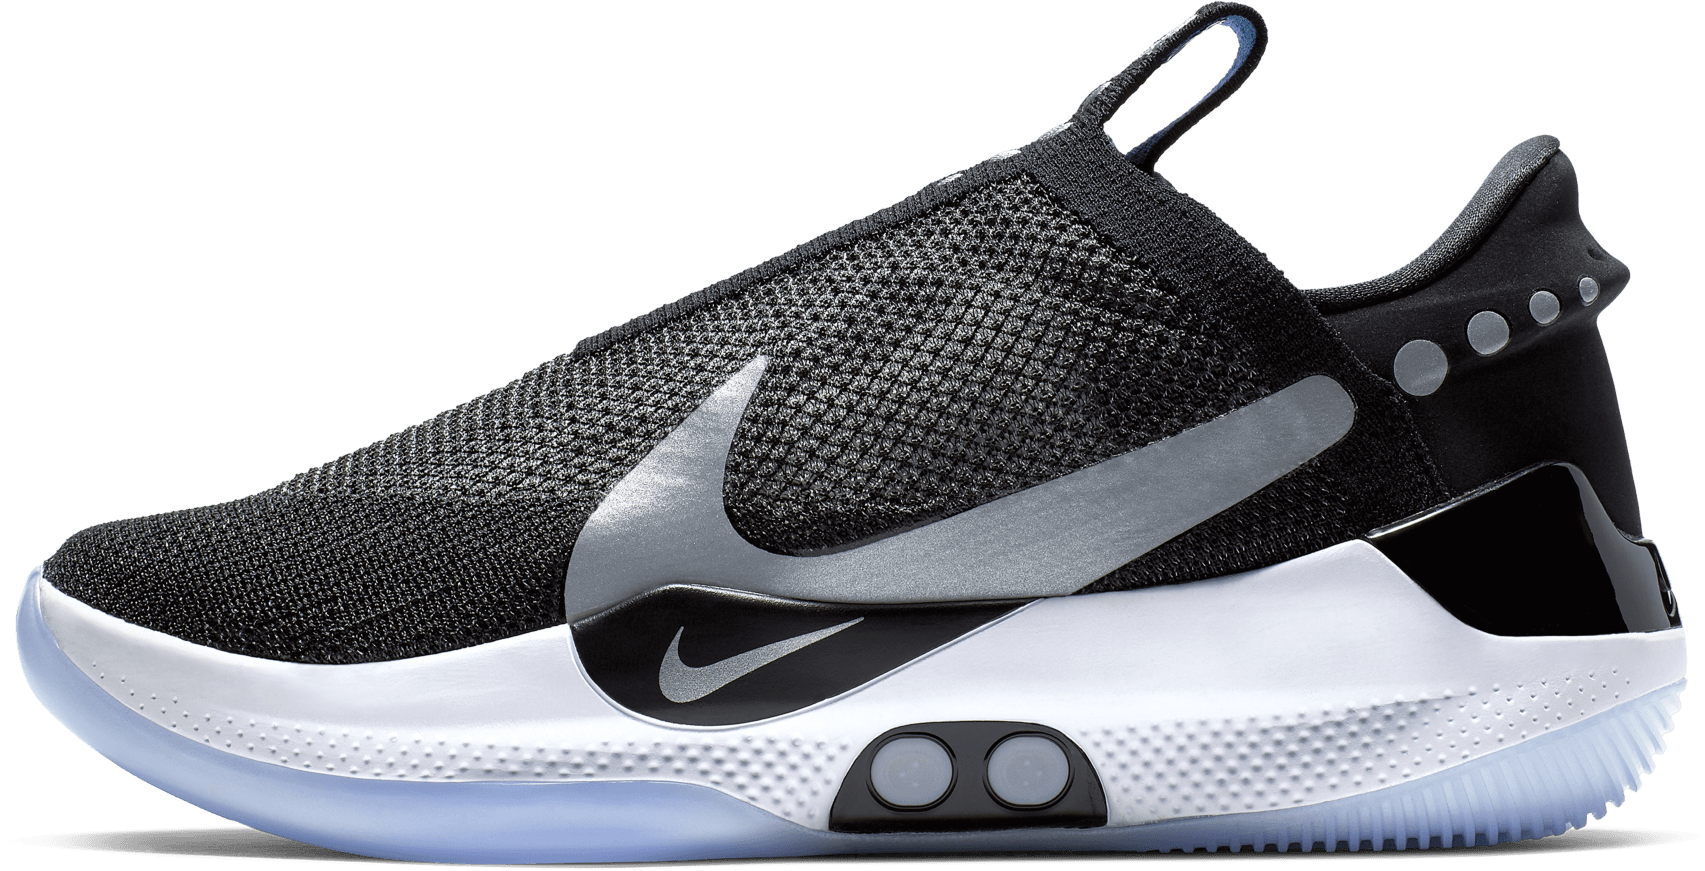 seco raqueta Matemáticas  Nike Adapt BB Performance Review